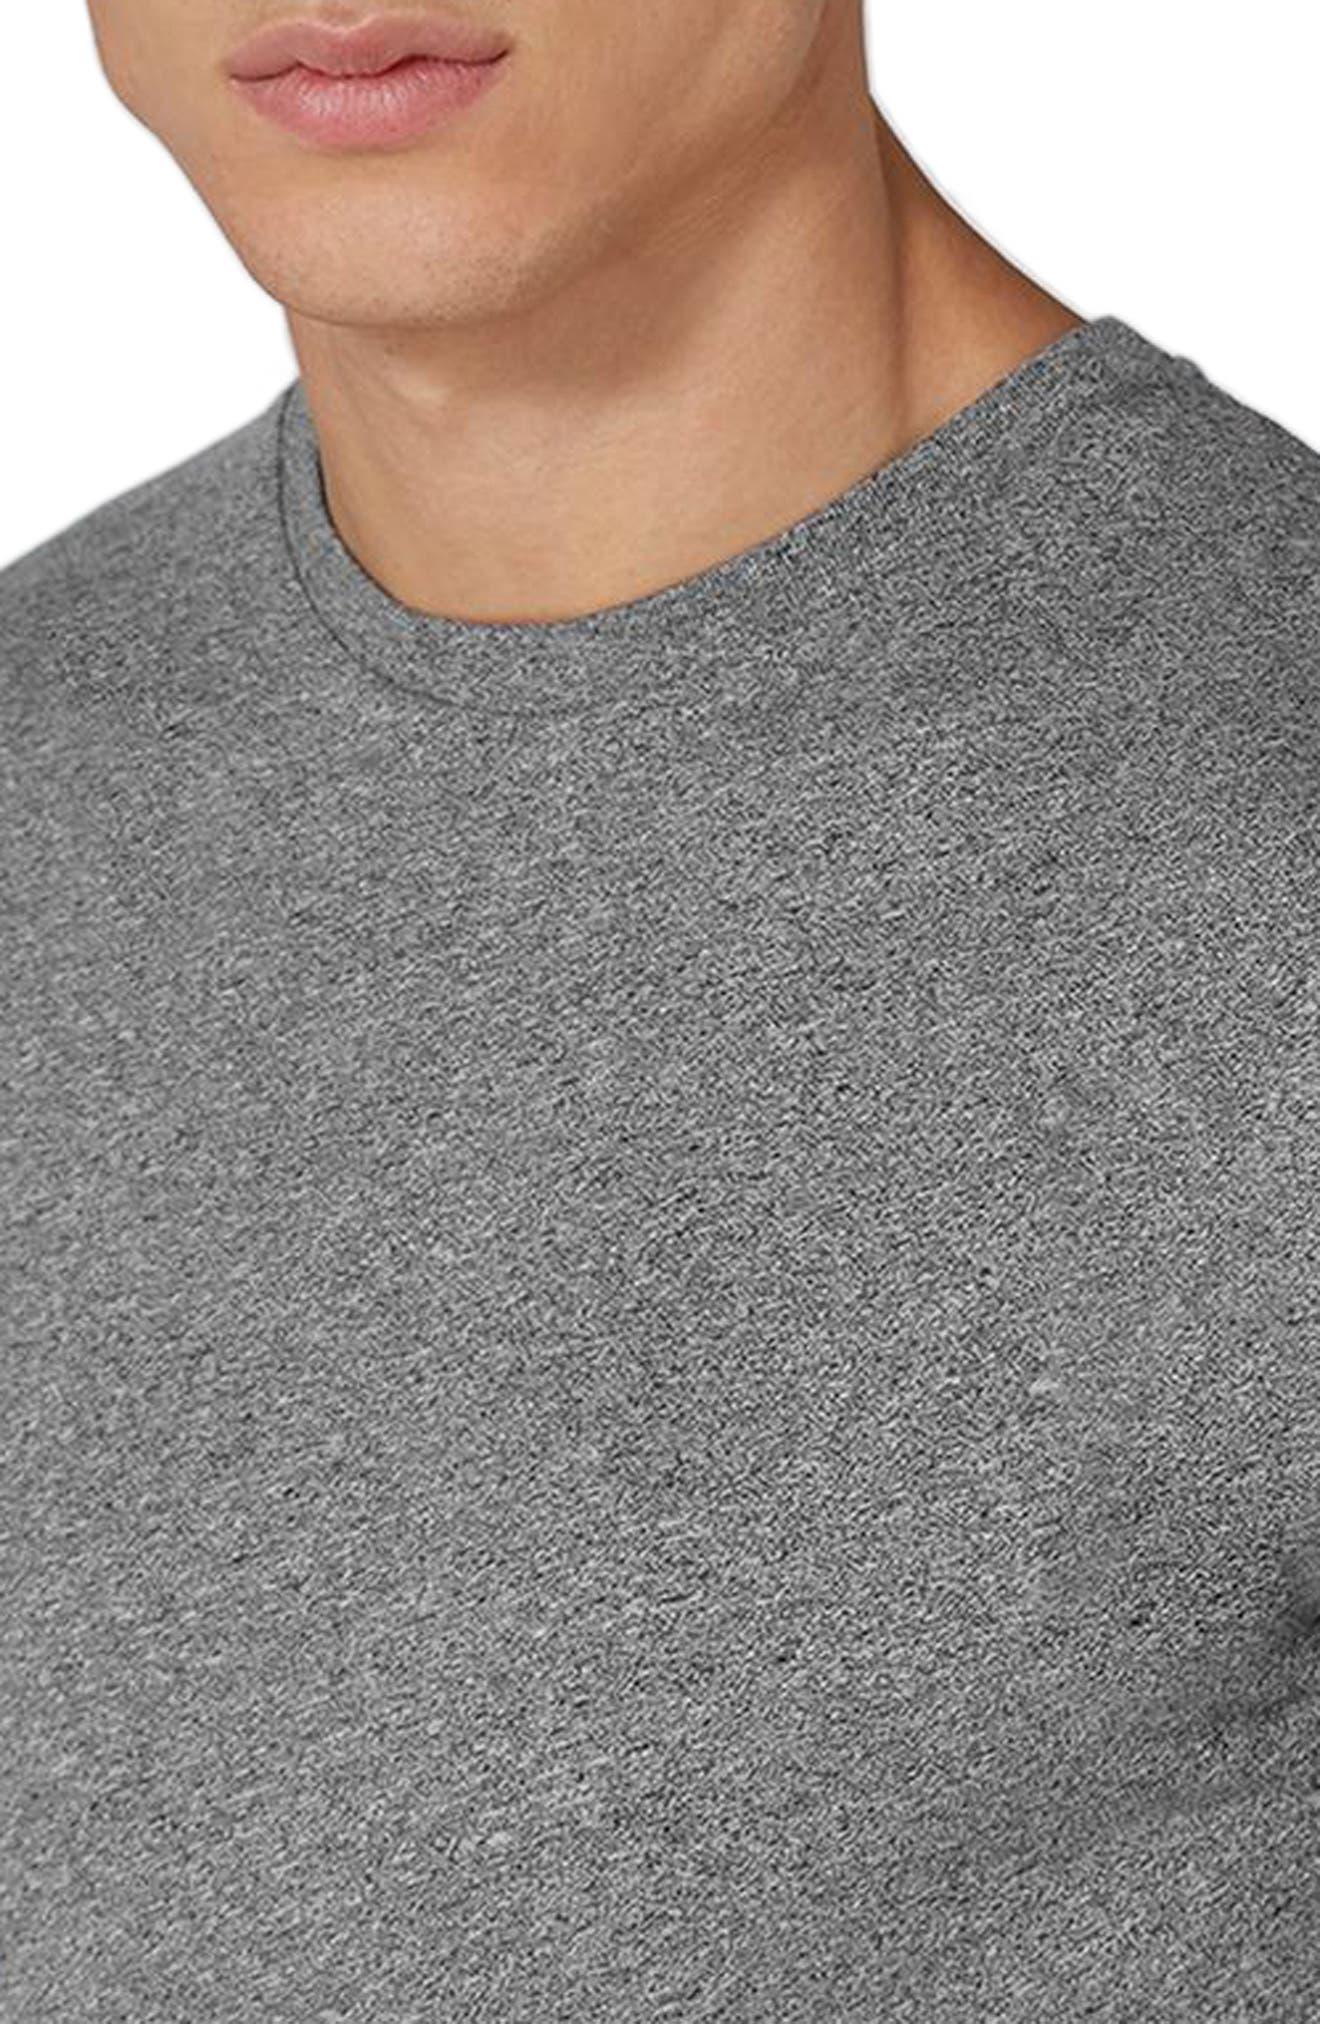 Muscle Fit Longline T-Shirt,                             Alternate thumbnail 3, color,                             Grey